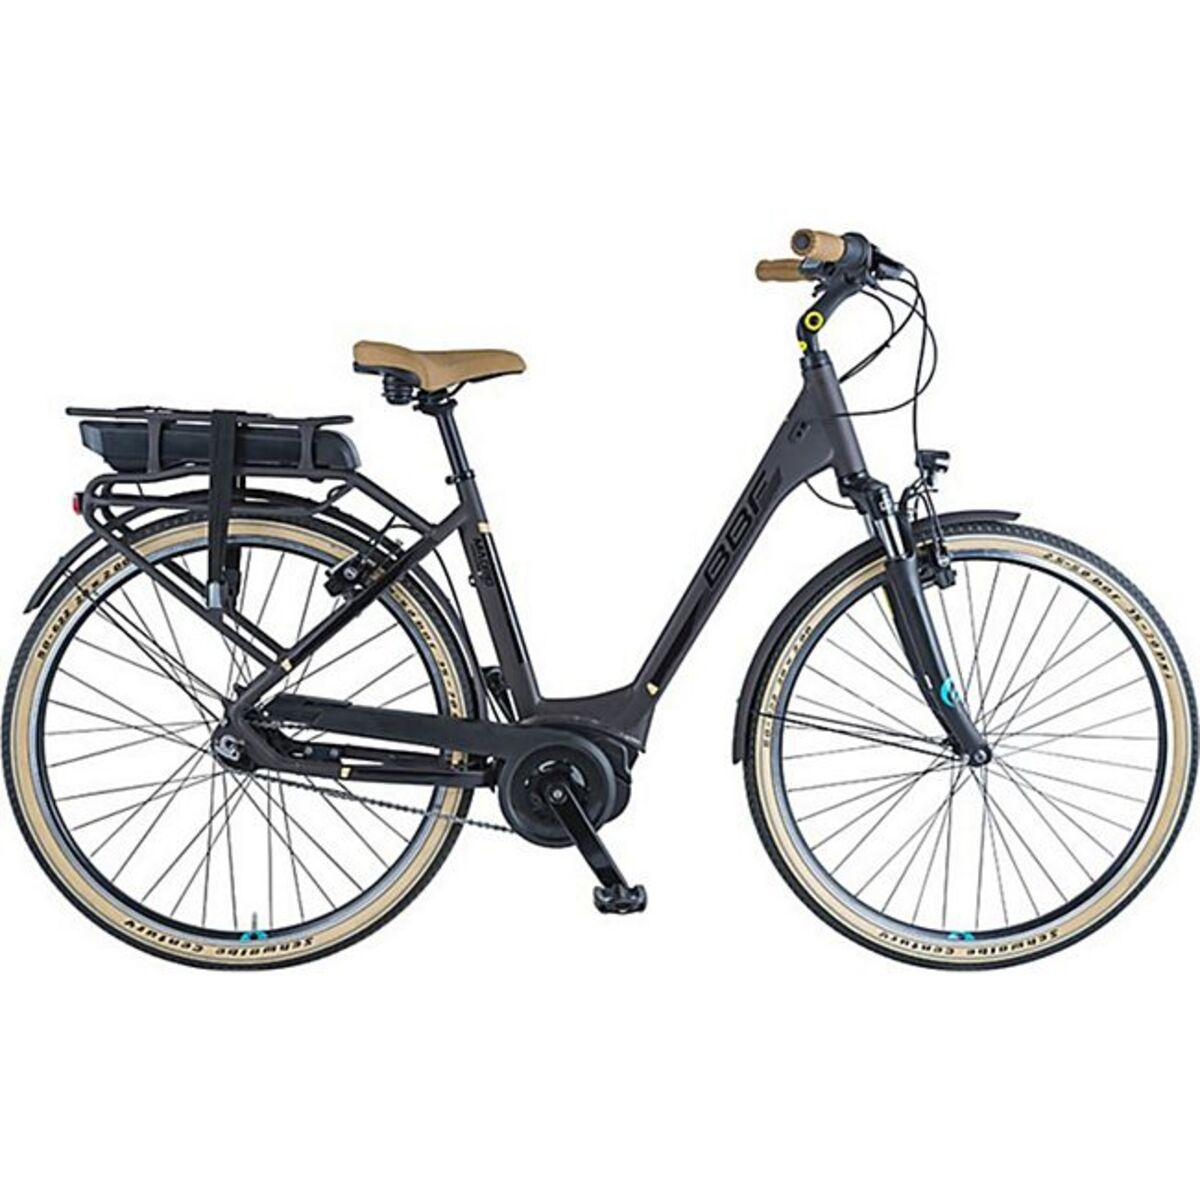 Bild 1 von BBF Madrid 700c E-Bike Damenrad Stadtrad 28 Zoll Pedelec Elektrofahrrad Citybike StVZO... 50 cm, braun